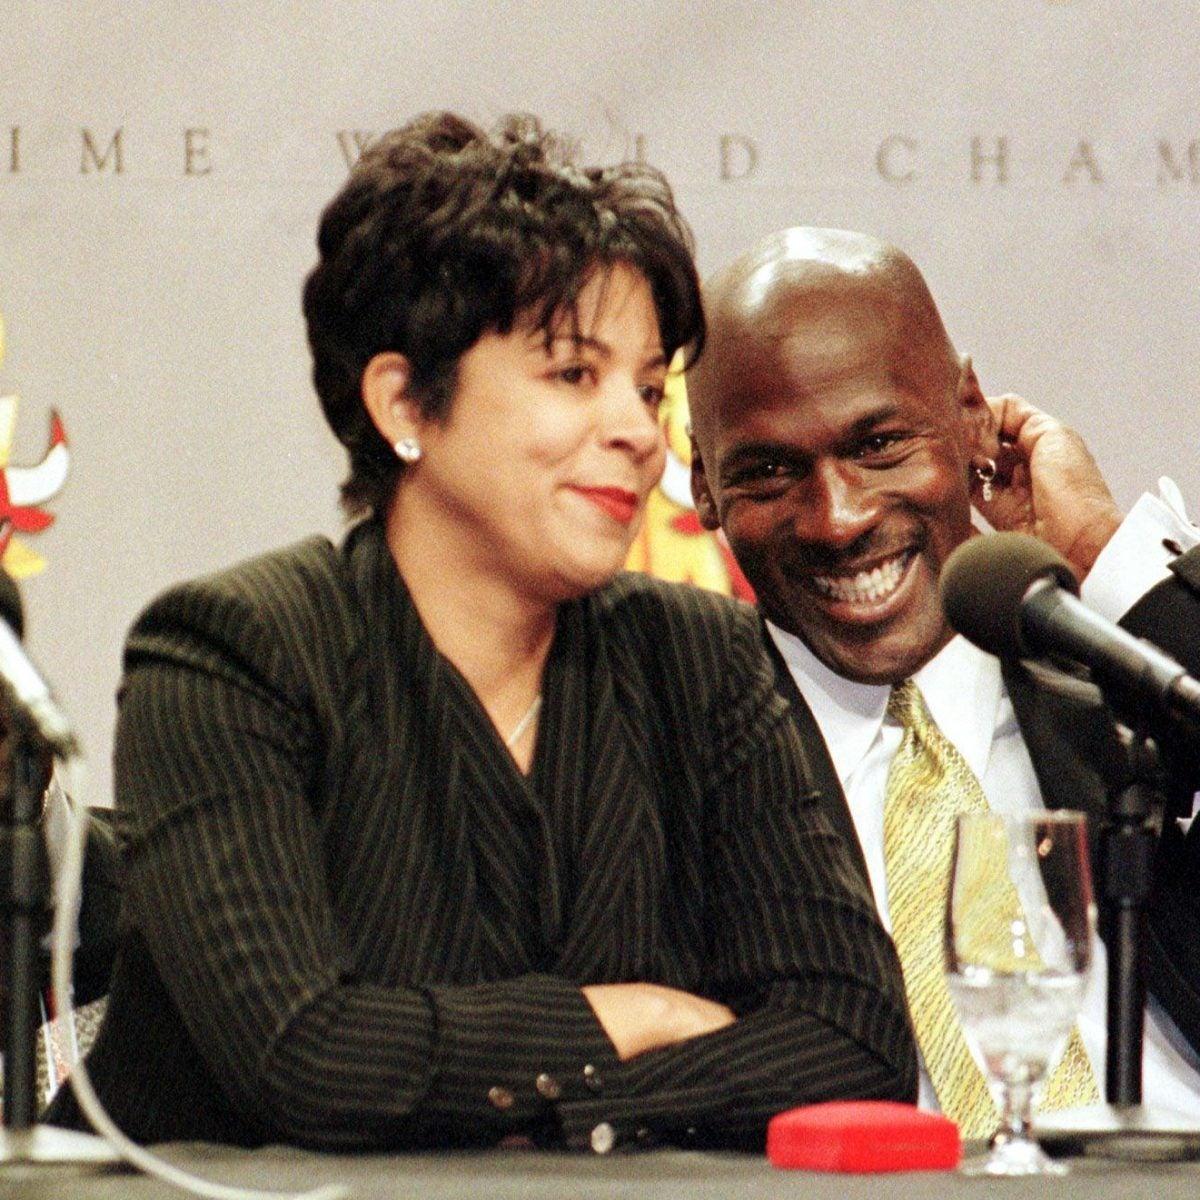 Michael Jordan's Daughter Jasmine On Her Mother Juanita's Absence From 'The Last Dance'